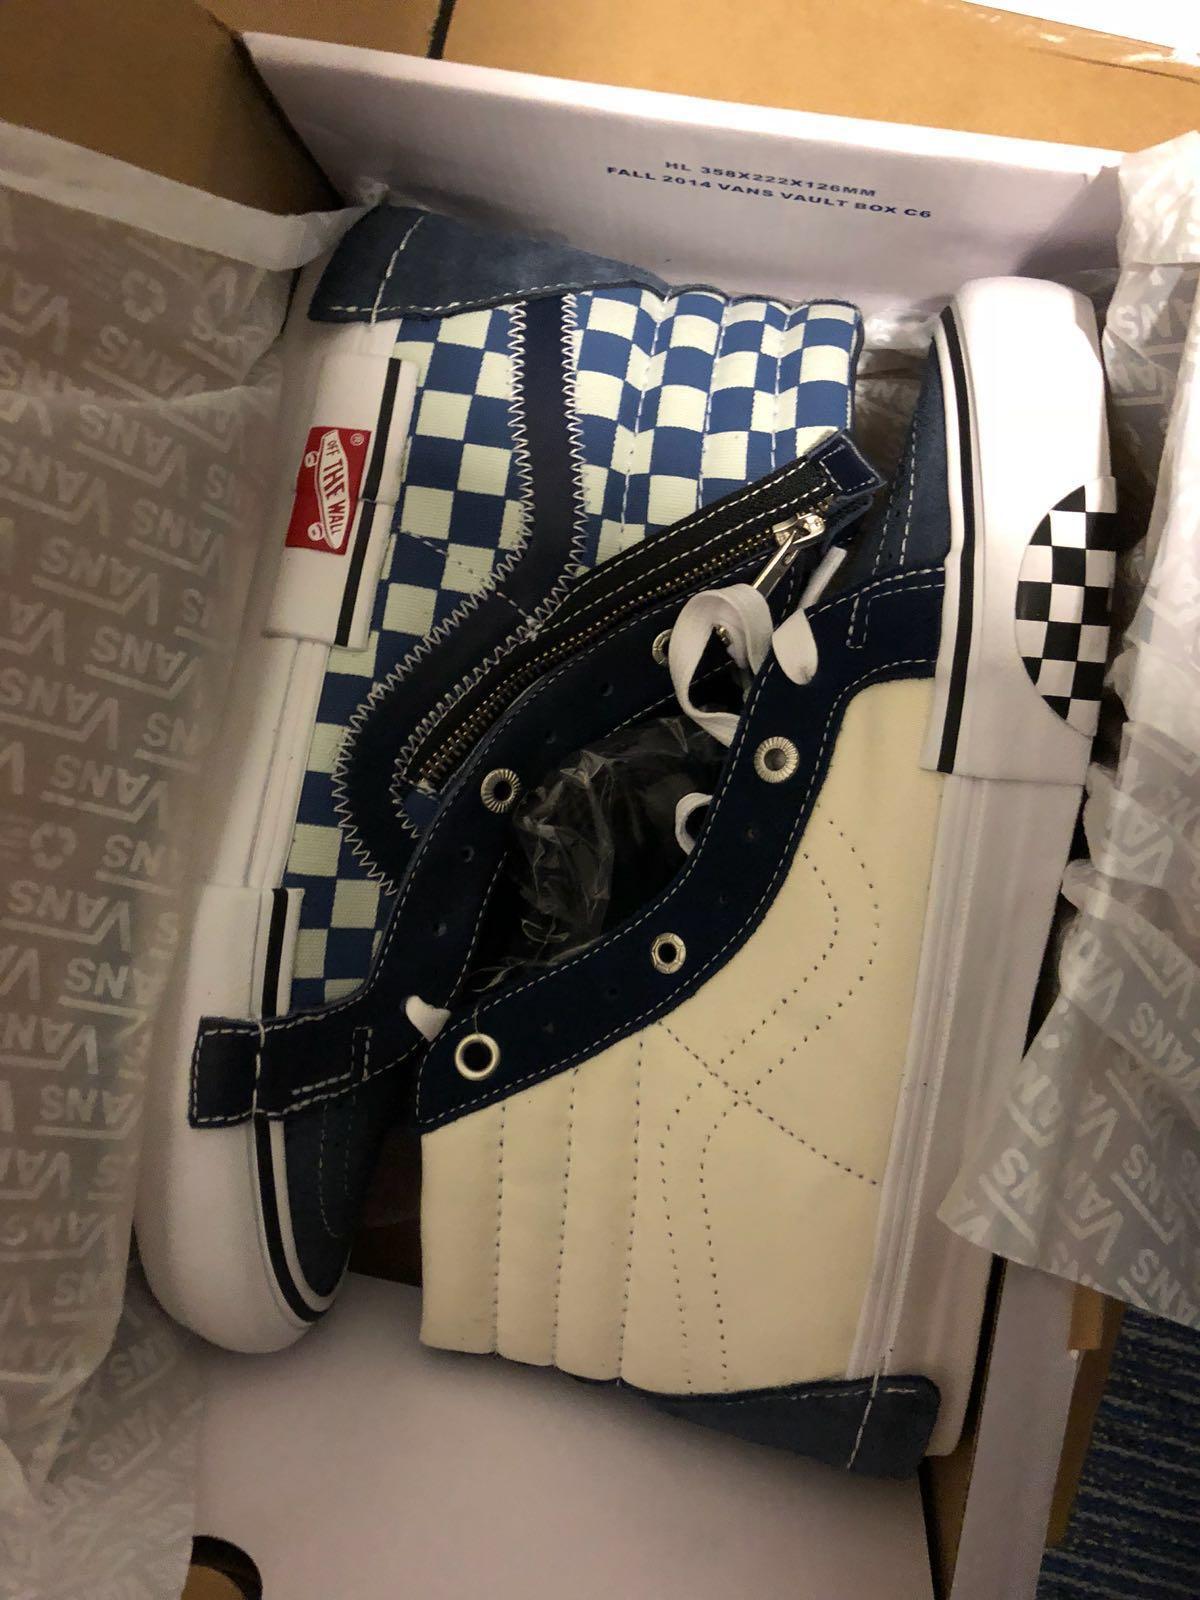 81d55ea769 Home · Men s Fashion · Footwear · Sneakers. photo photo photo photo